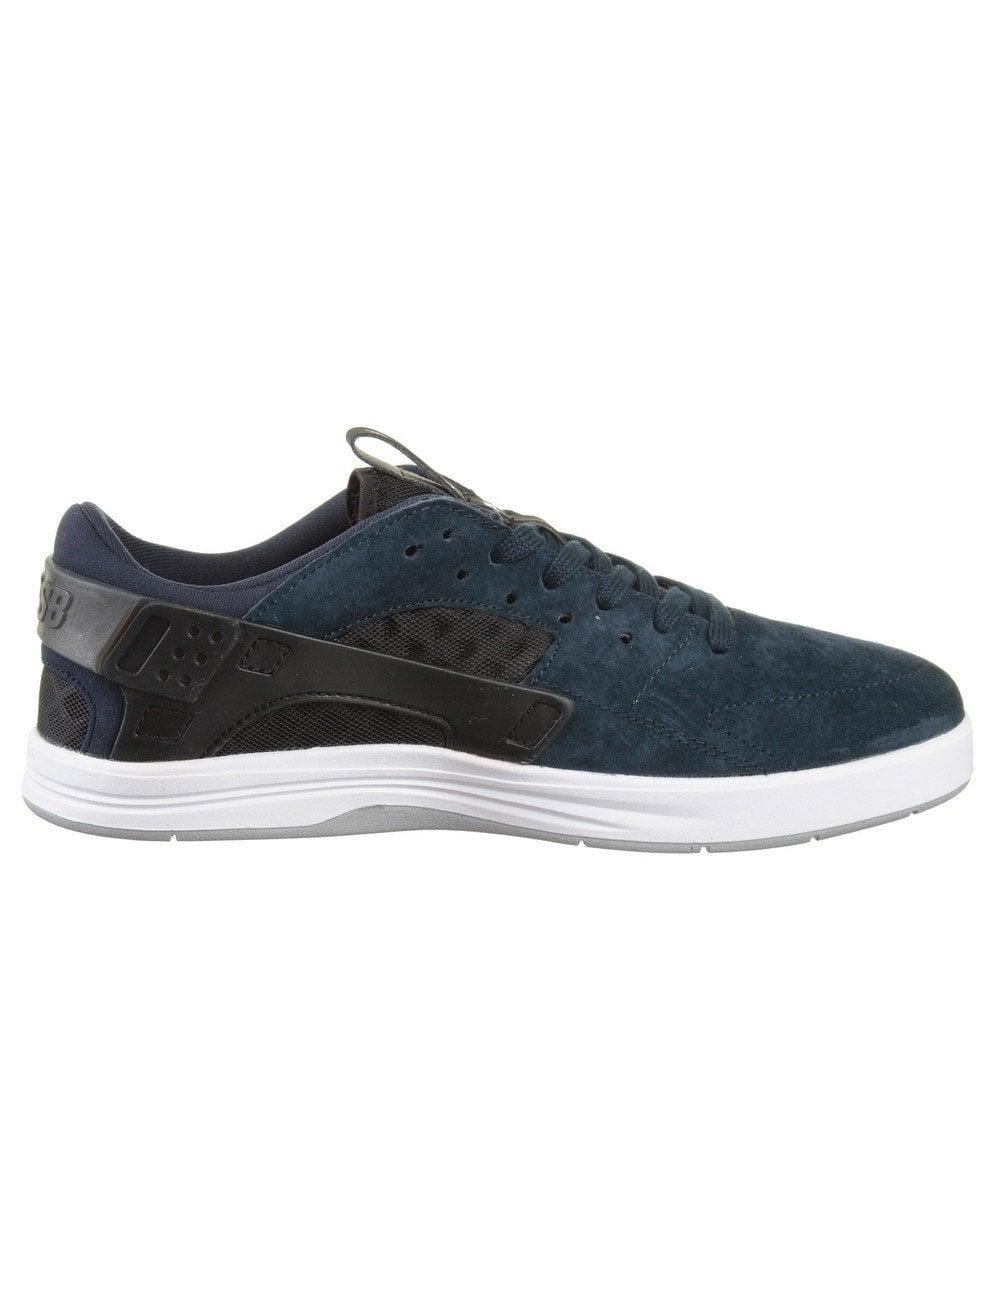 ca7abc01e09d Nike SB Eric Koston Huarache - Dark Obsidian White - Footwear from ...